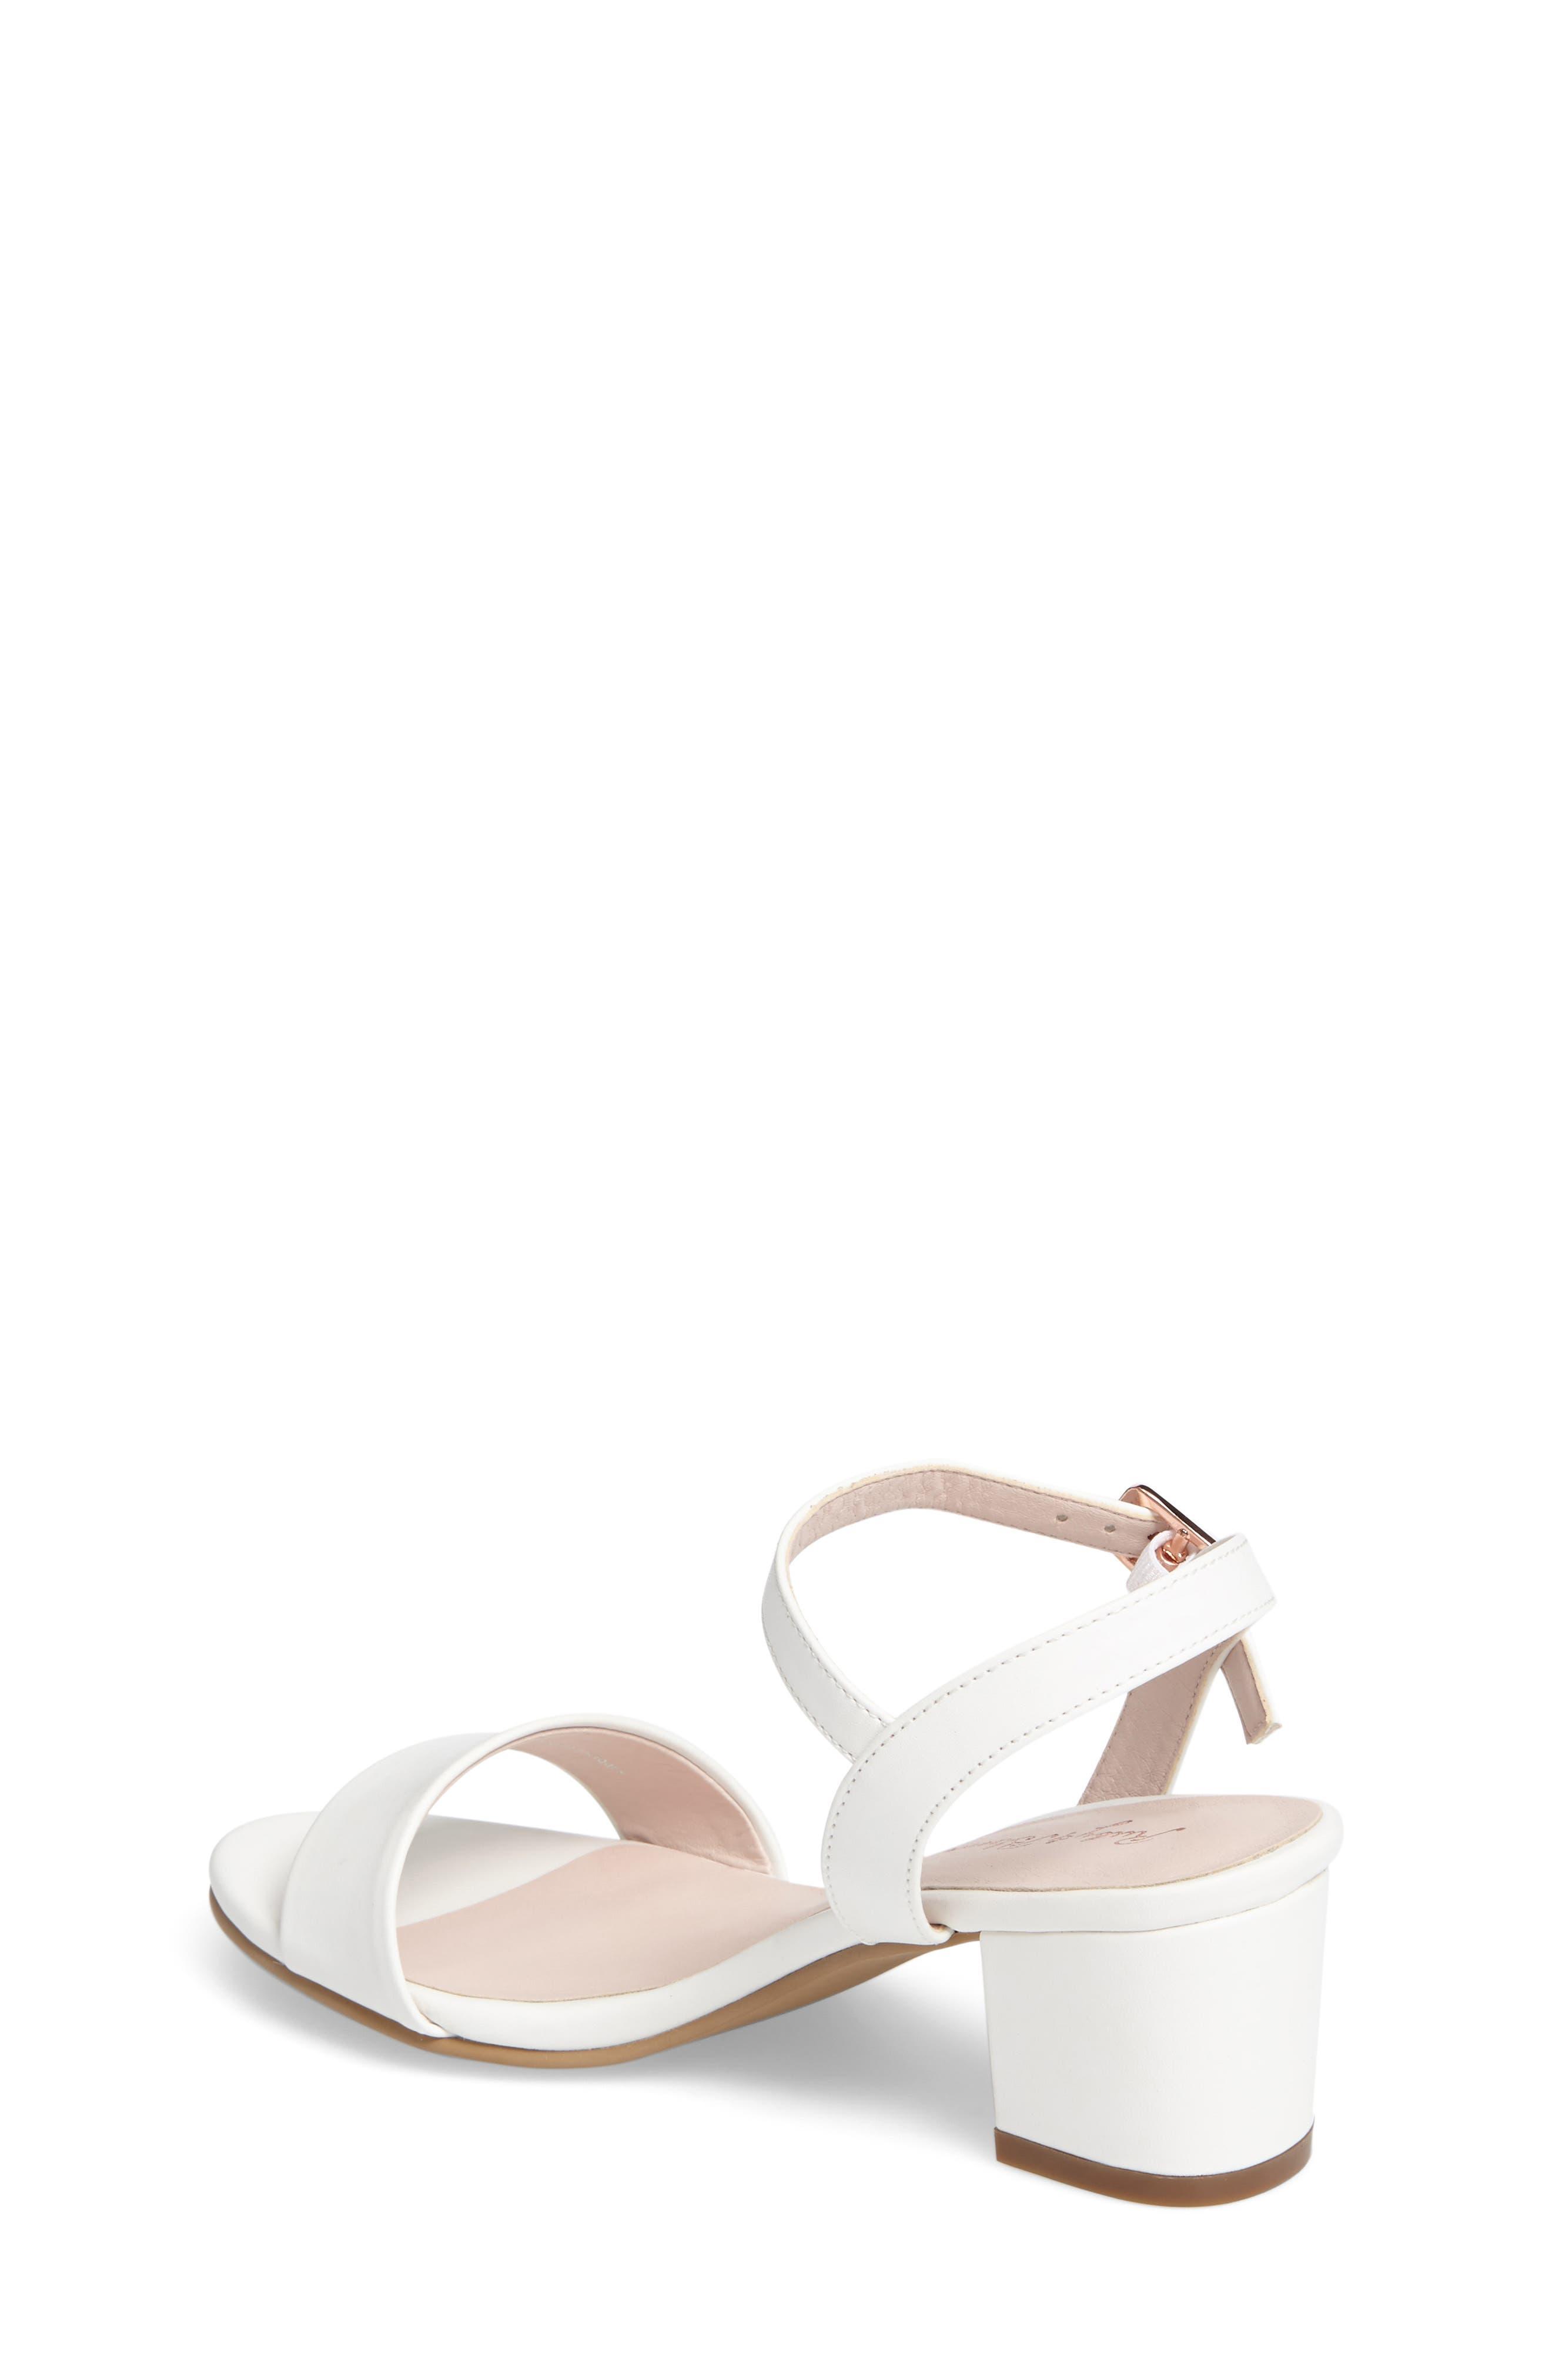 Danni Block Heel Sandal,                             Alternate thumbnail 2, color,                             WHITE FAUX LEATHER